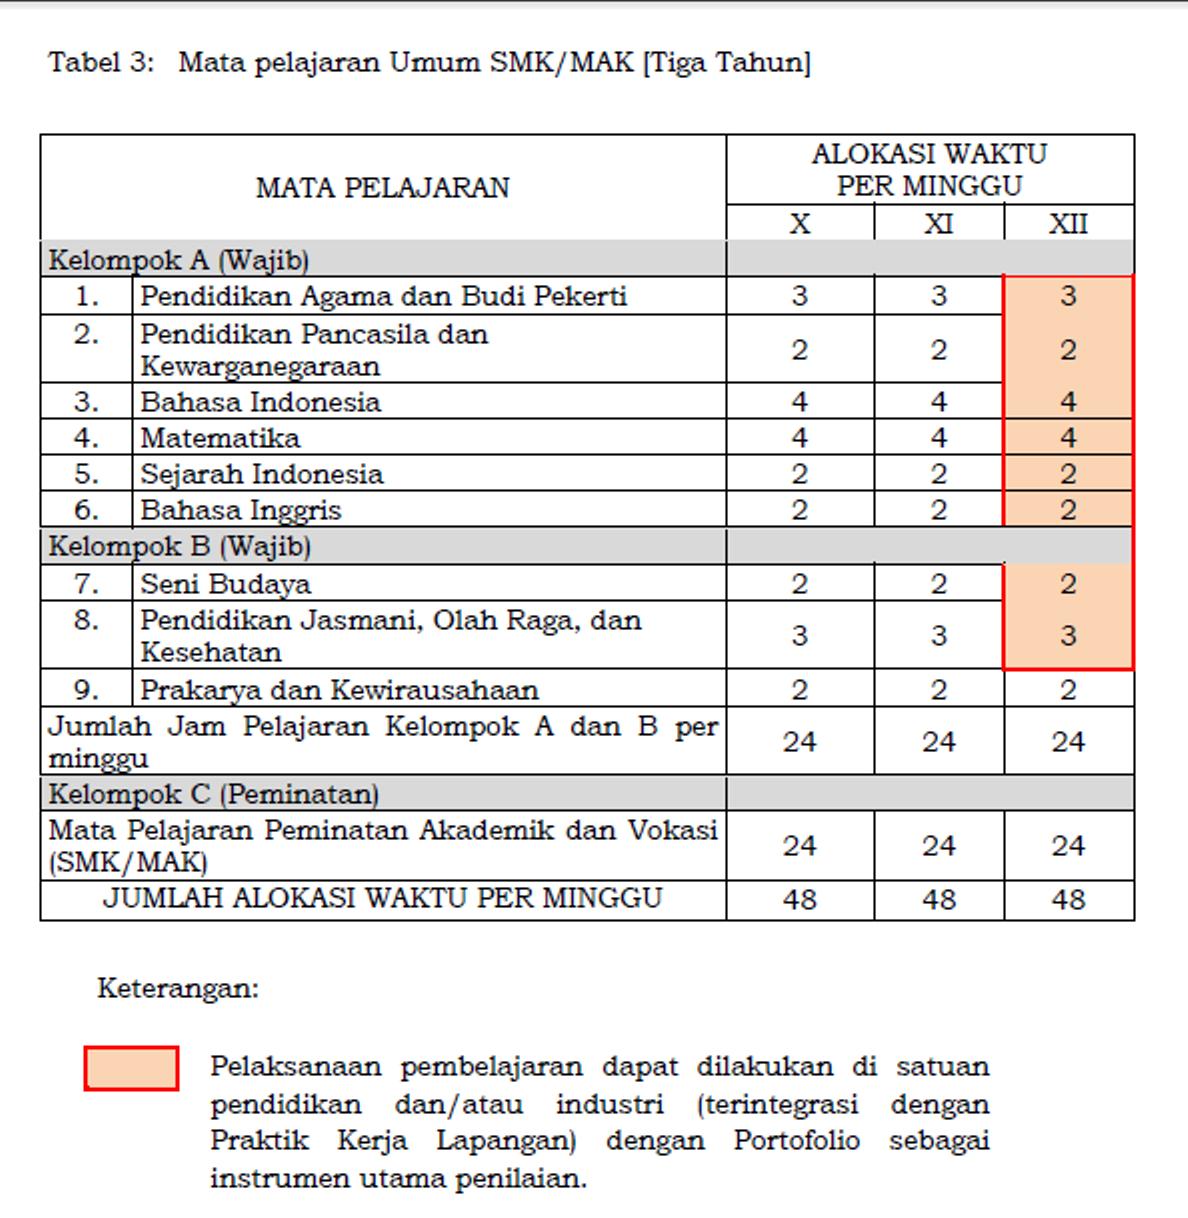 Struktur Kurikulum Smk Kurikulum 2013 Bidang Keahlian Bisnis Manajemen Merah Putih Biru